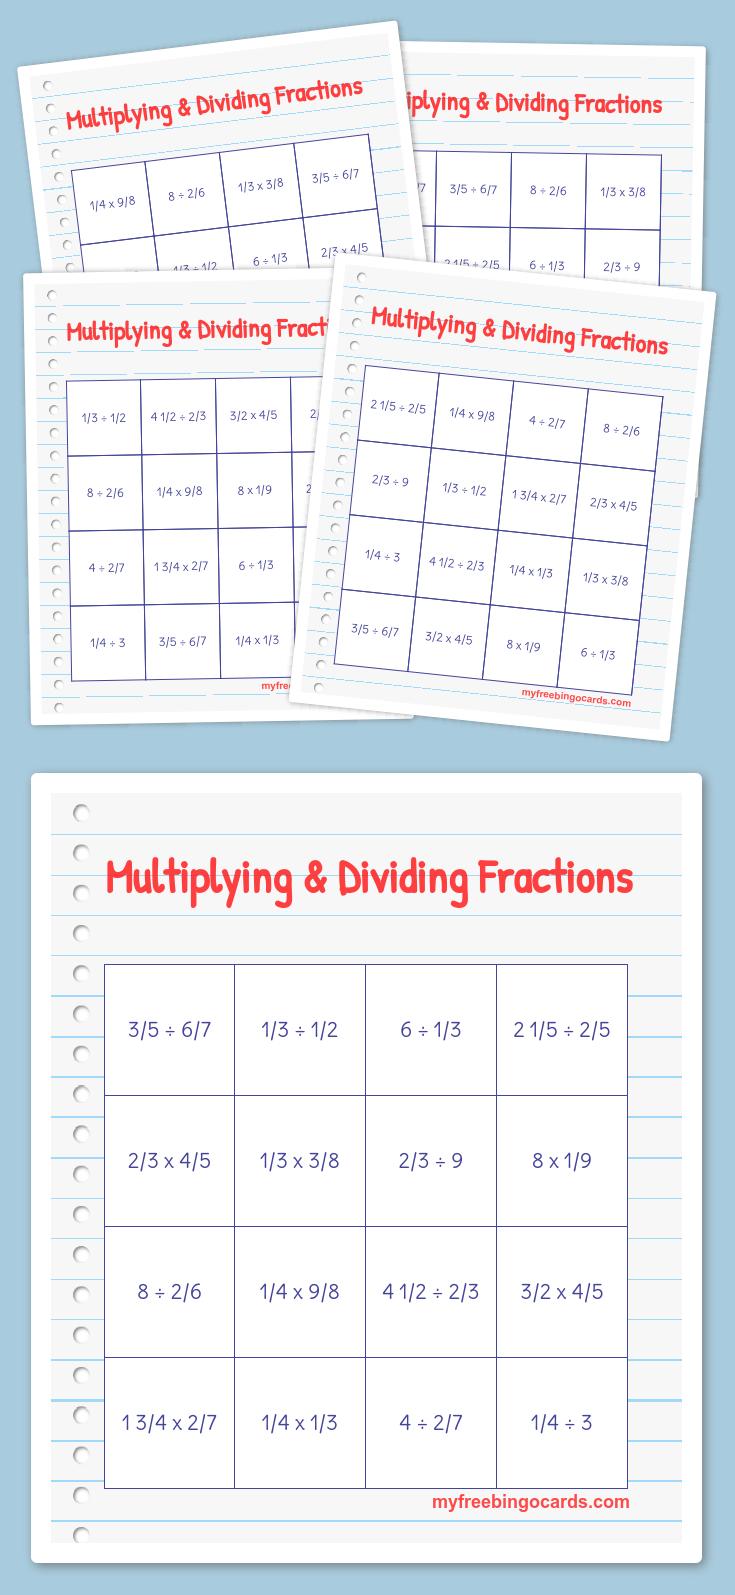 Multiplying & Dividing Fractions Bingo | Free Printable